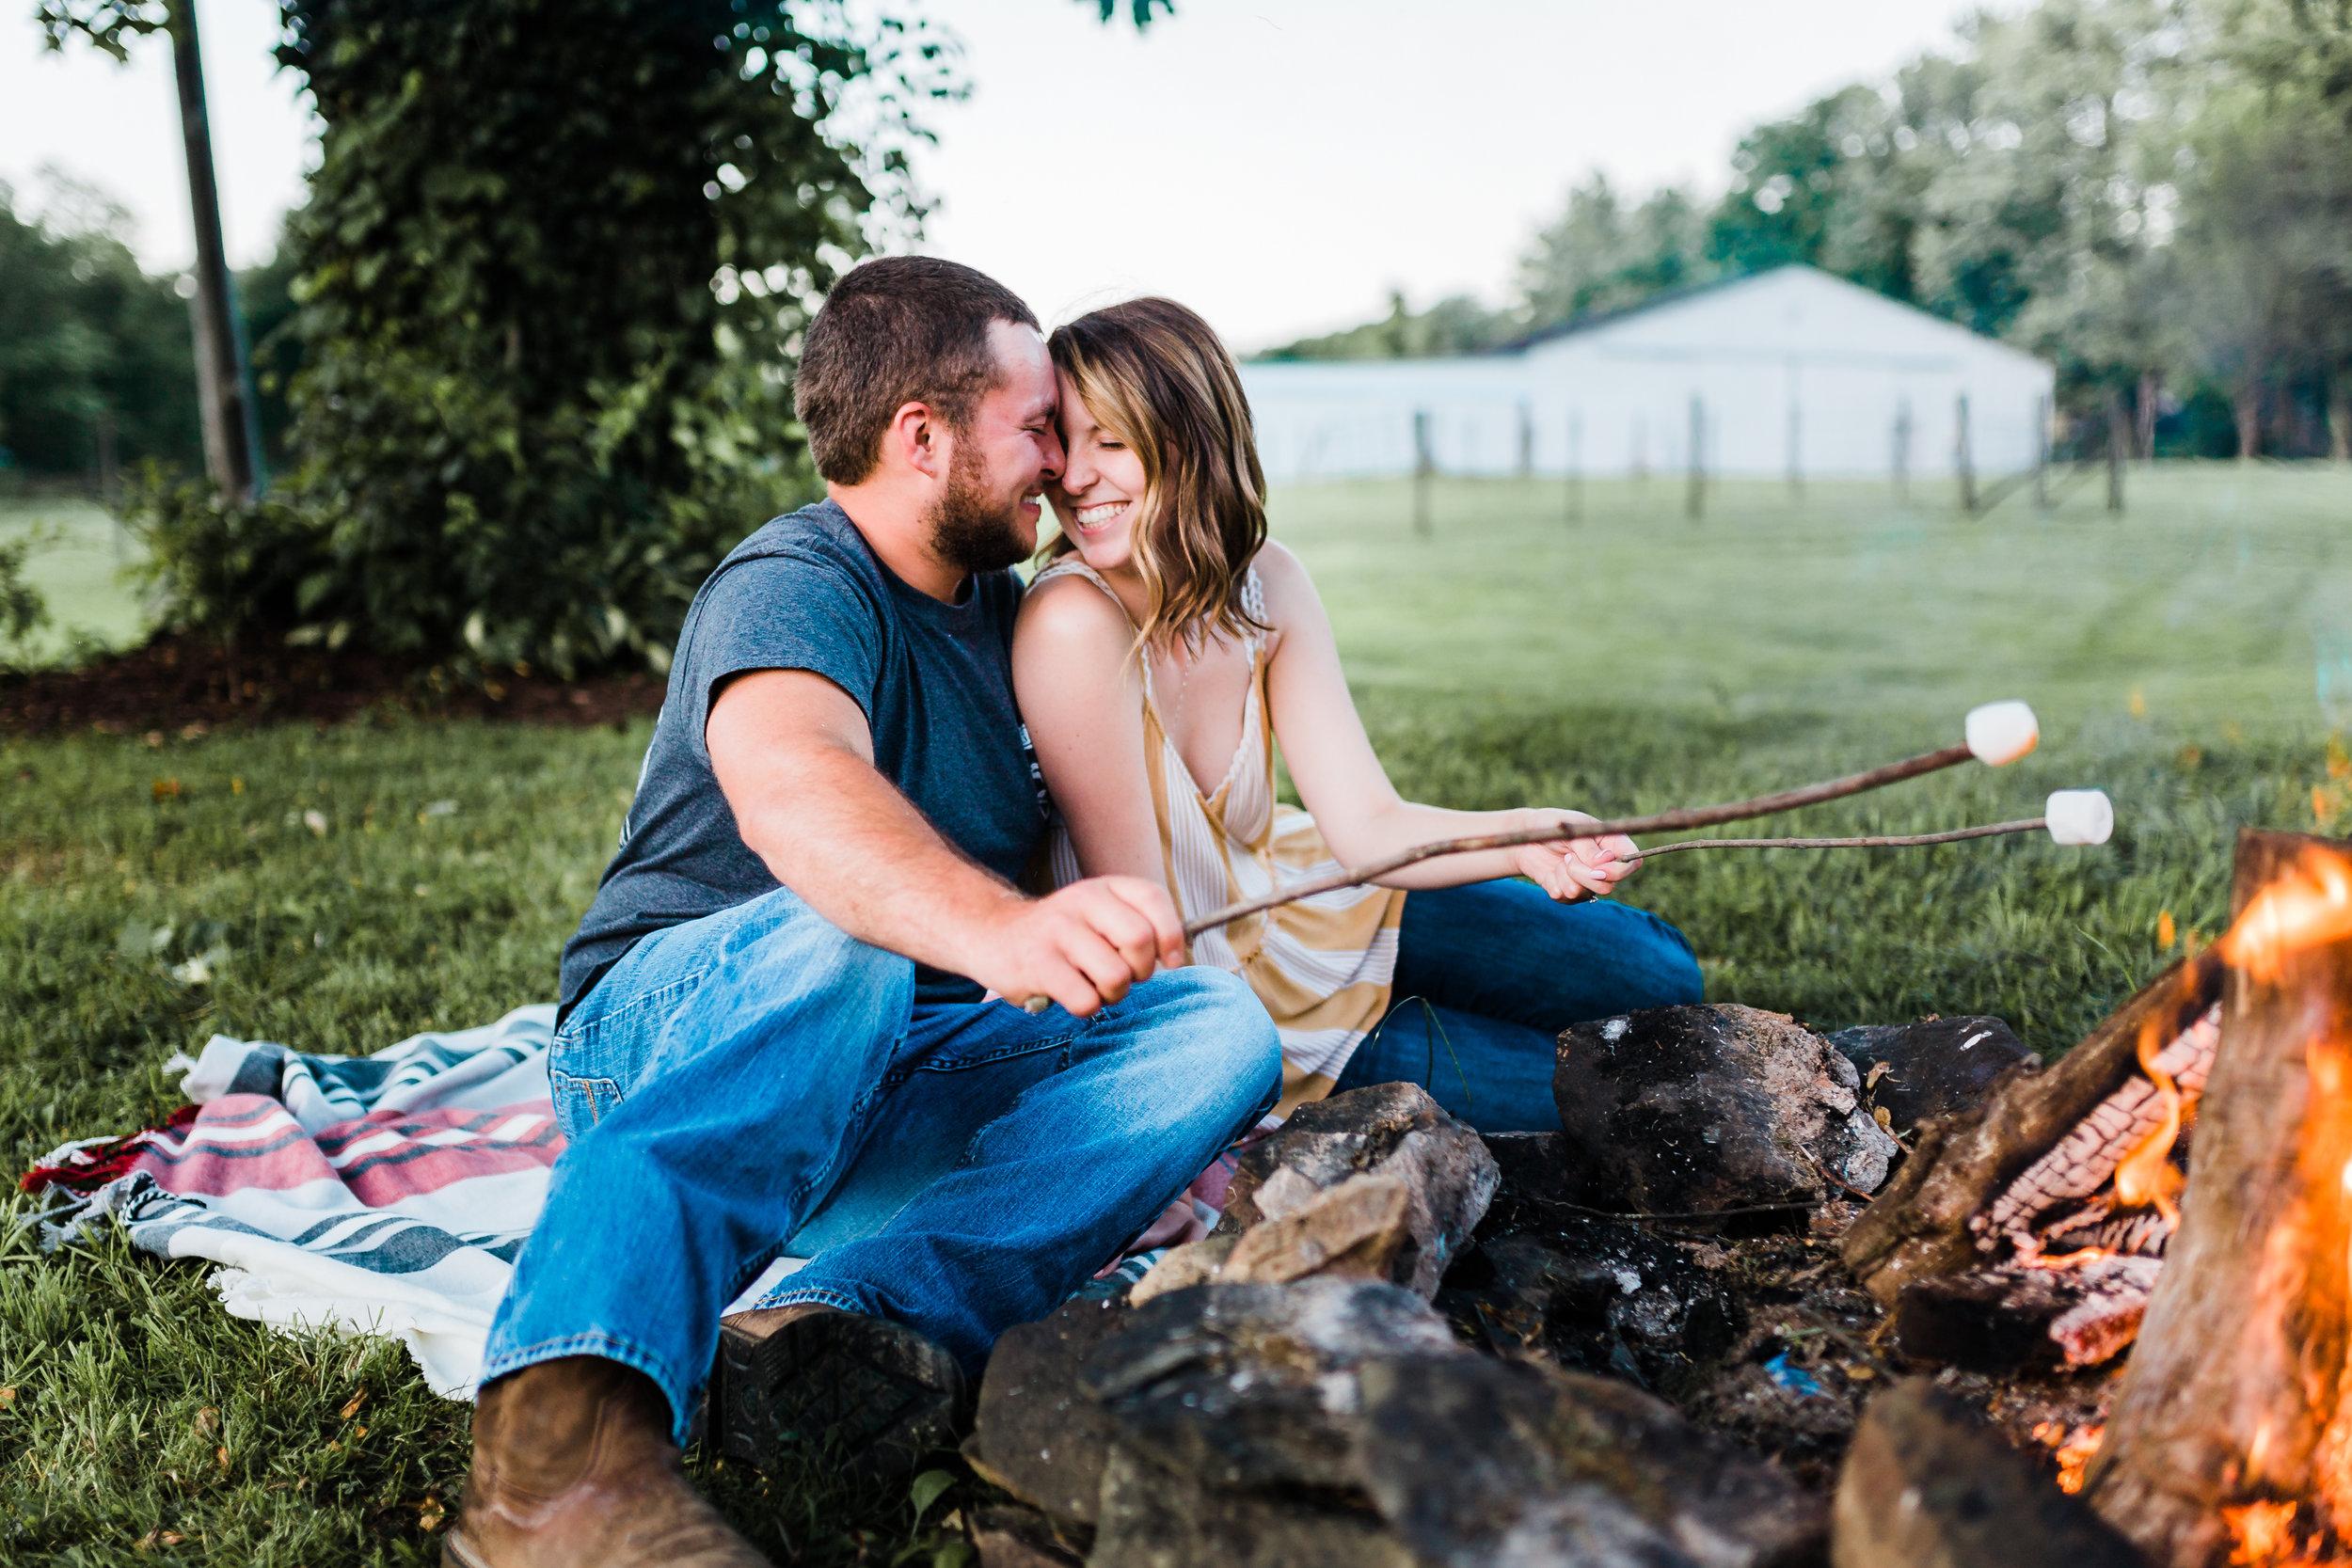 engagement session with bonfire - maryland photographer